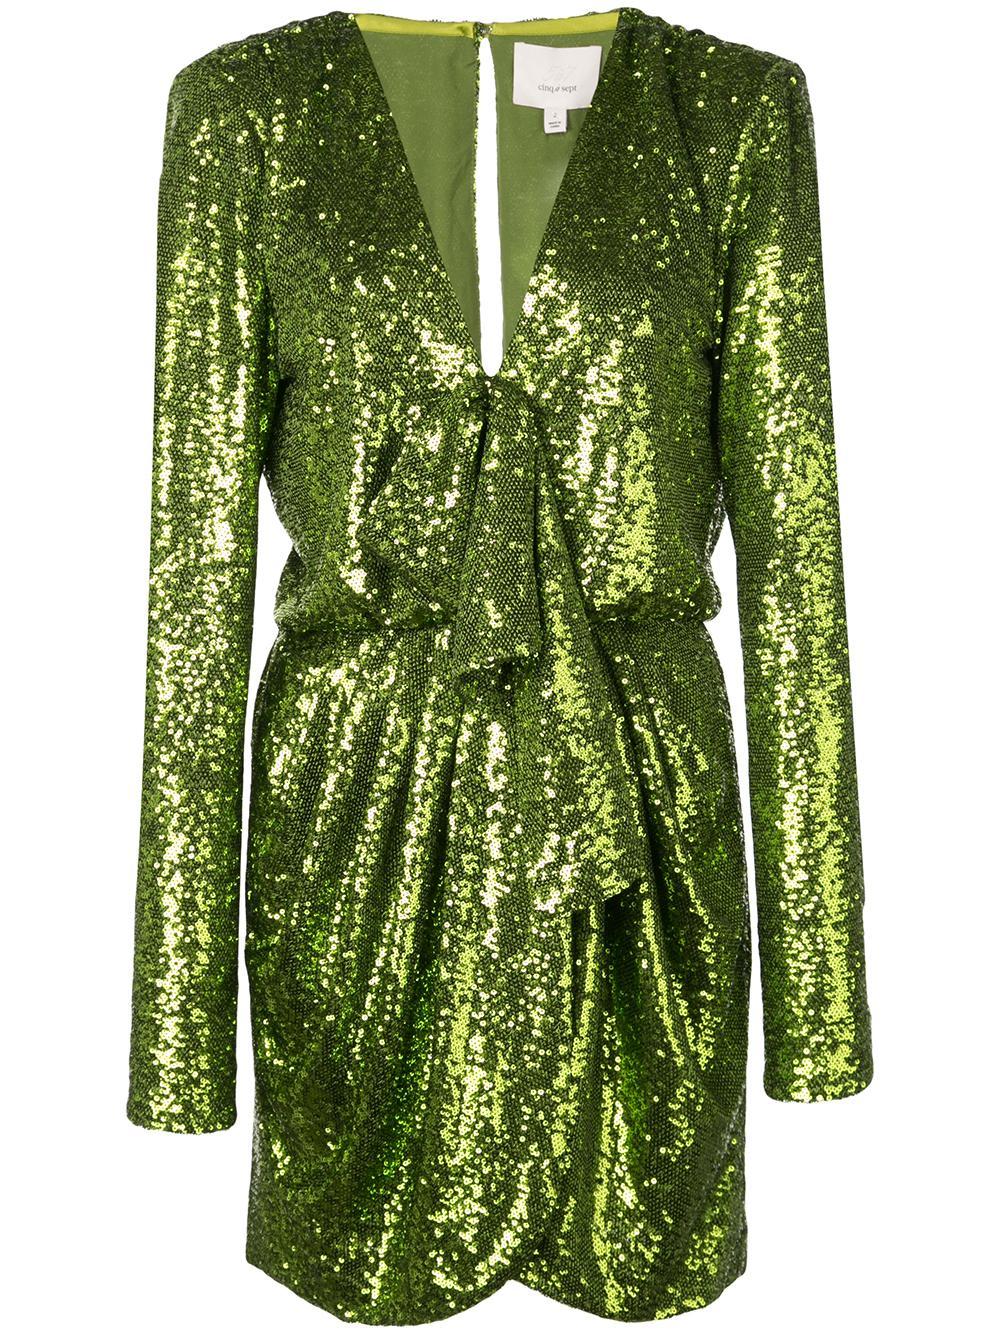 Skylar Sequin Gathered Front Short Dress Item # ZD9782776Z